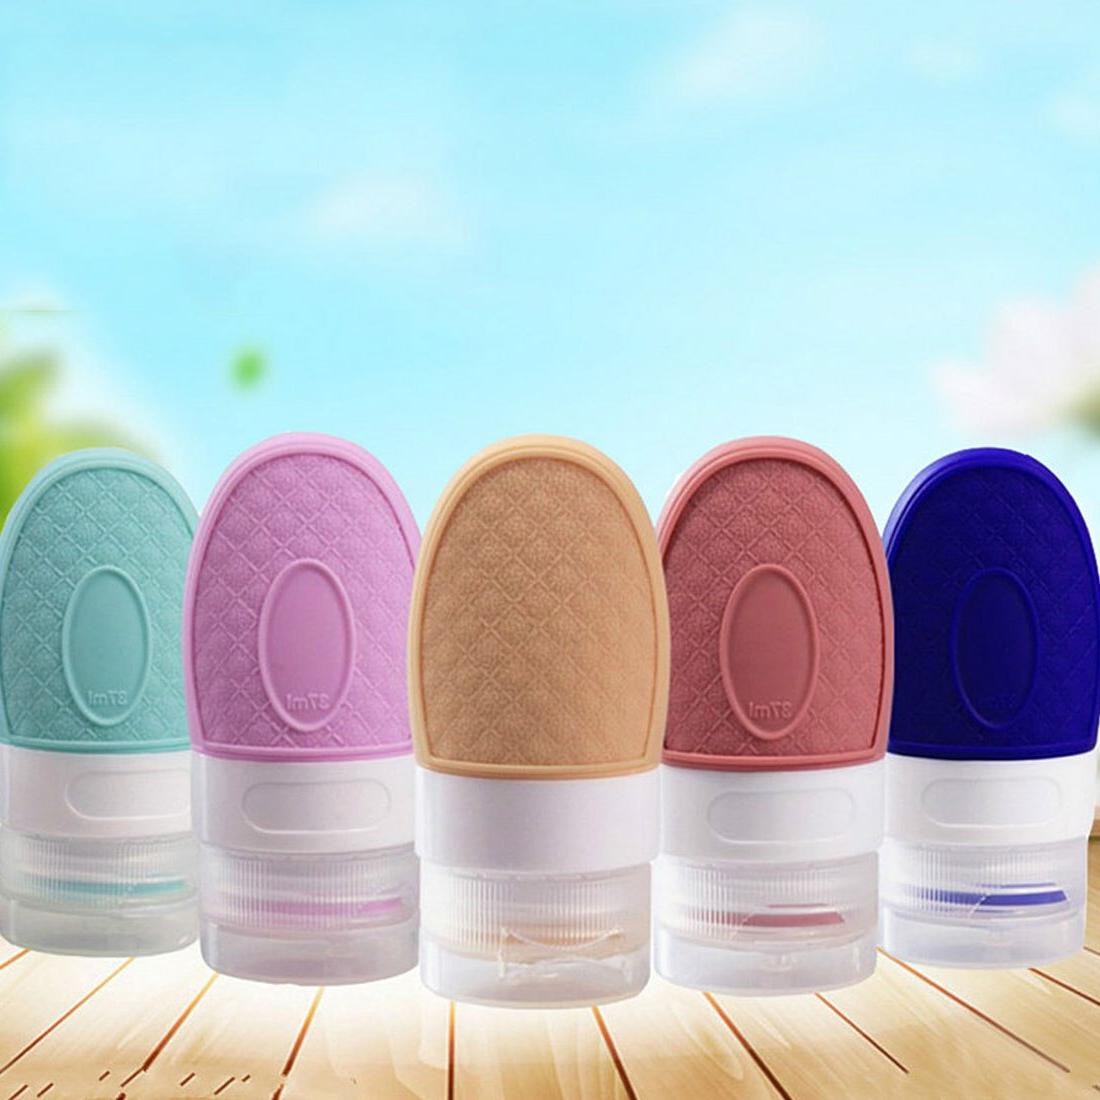 Travel sub-bottle cosmetic shower <font><b>gel</b></font> <font><b>hand</b></font> <font><b>soap</b></font> lotion squeeze bottle